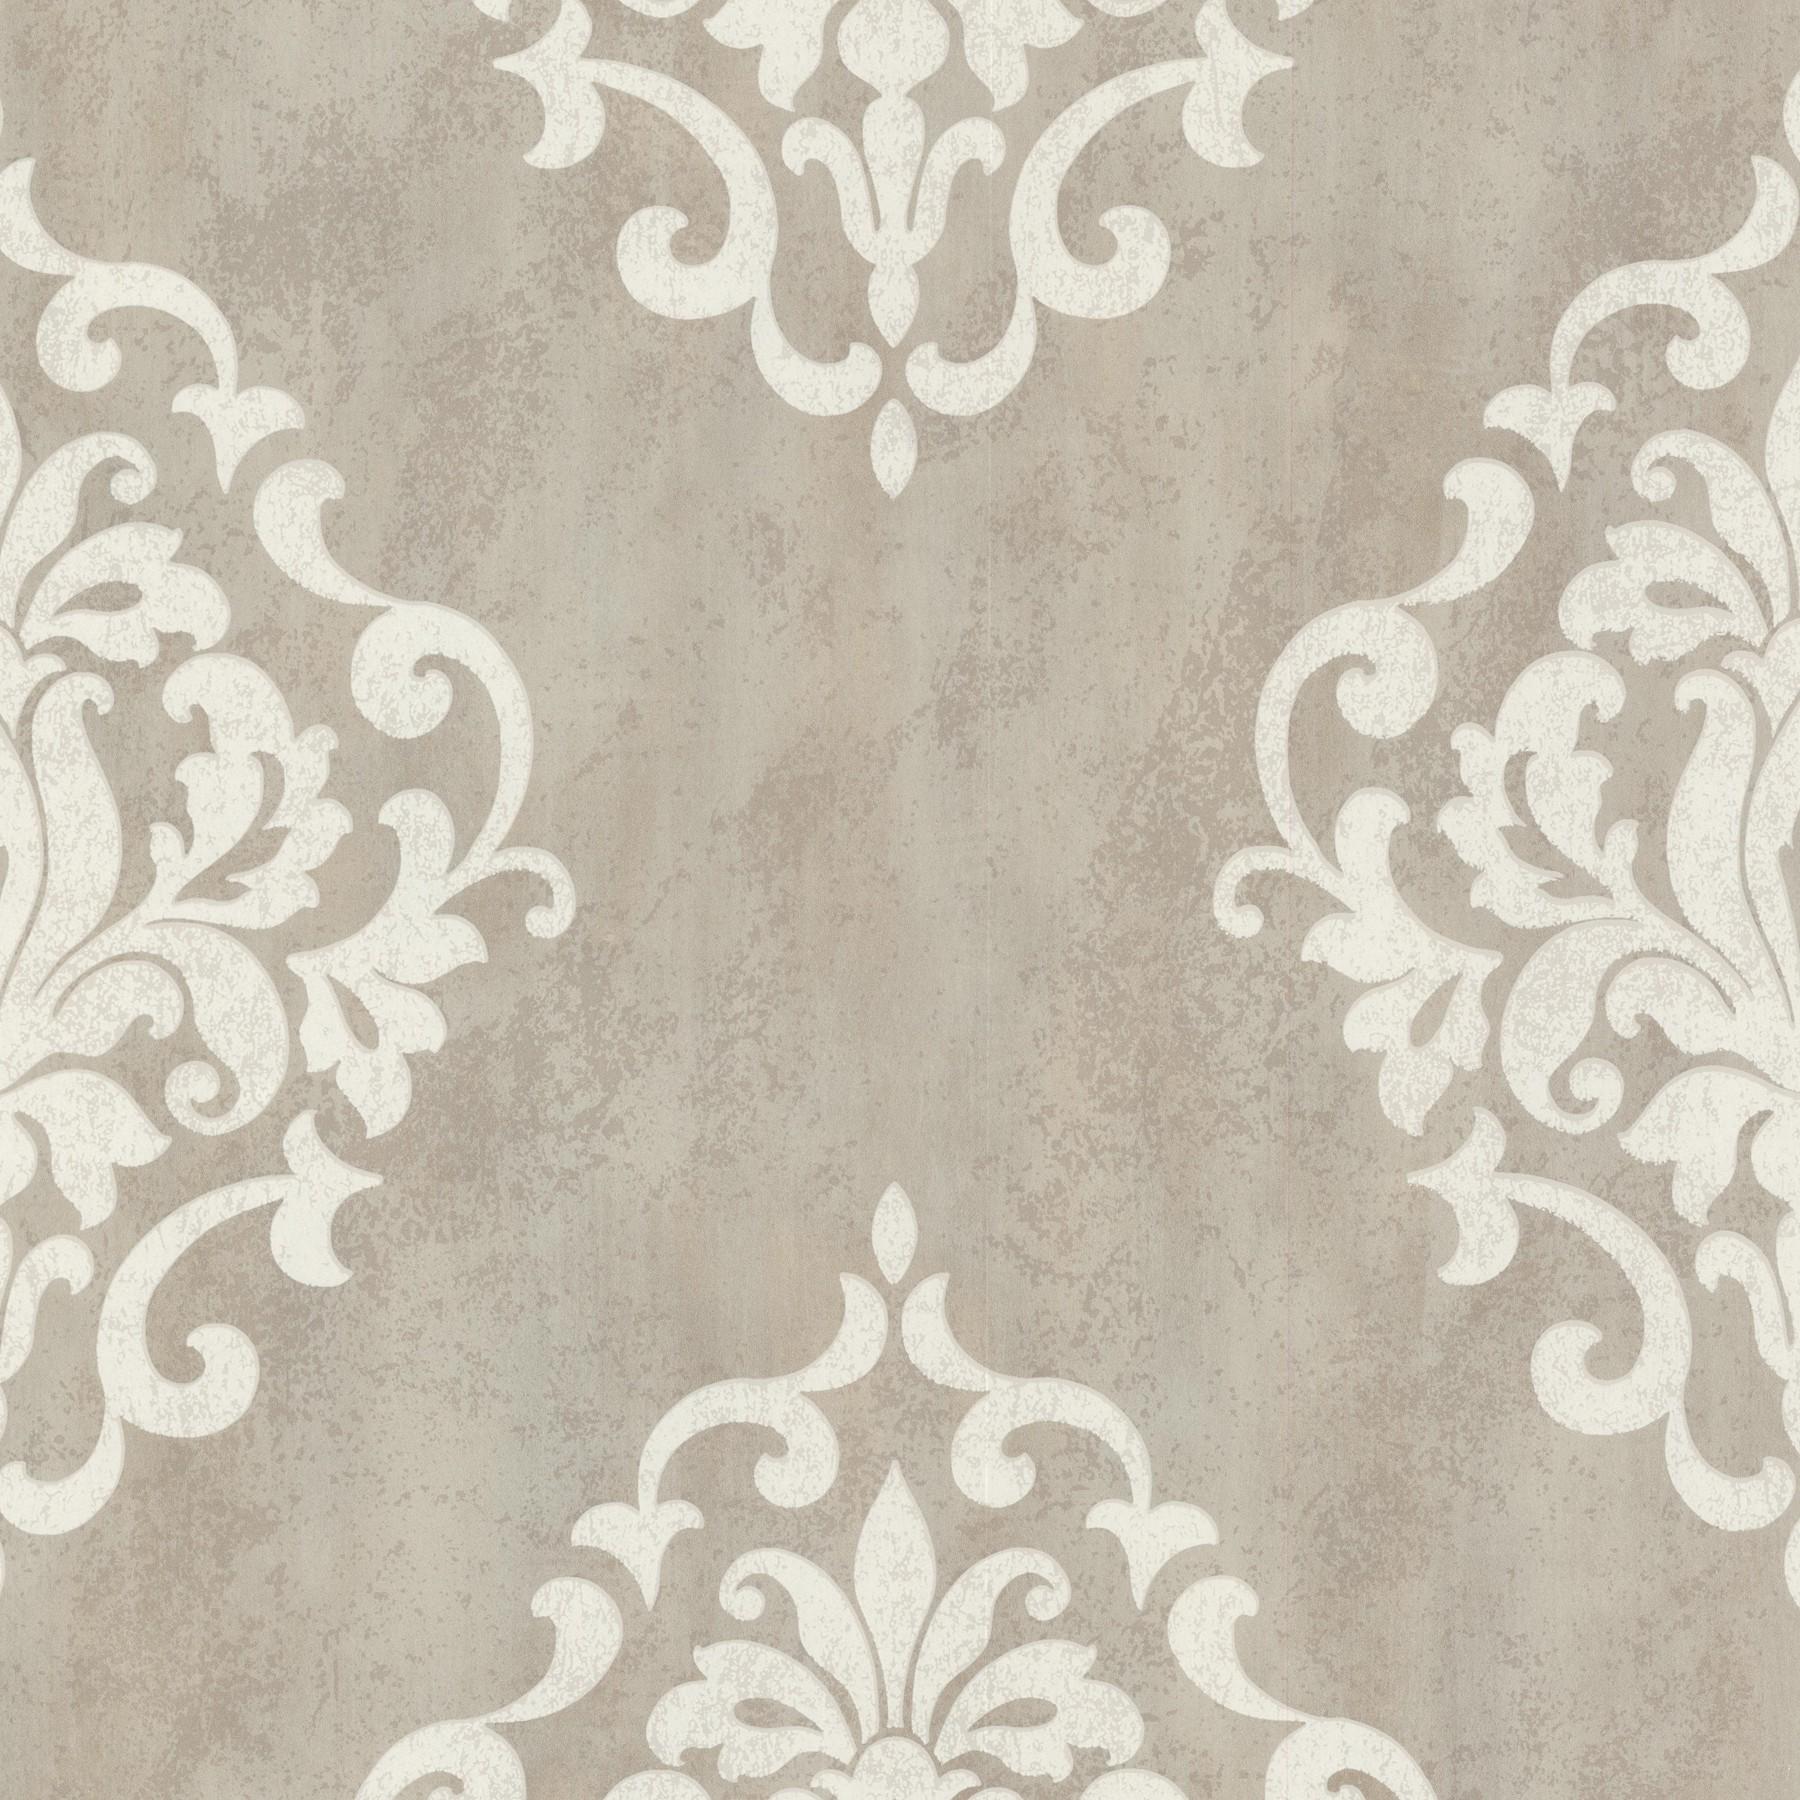 Barock Tapete Beige Creme : Tapete Onyx Vliestapete Rasch Textil 020085 Barock grau-beige creme